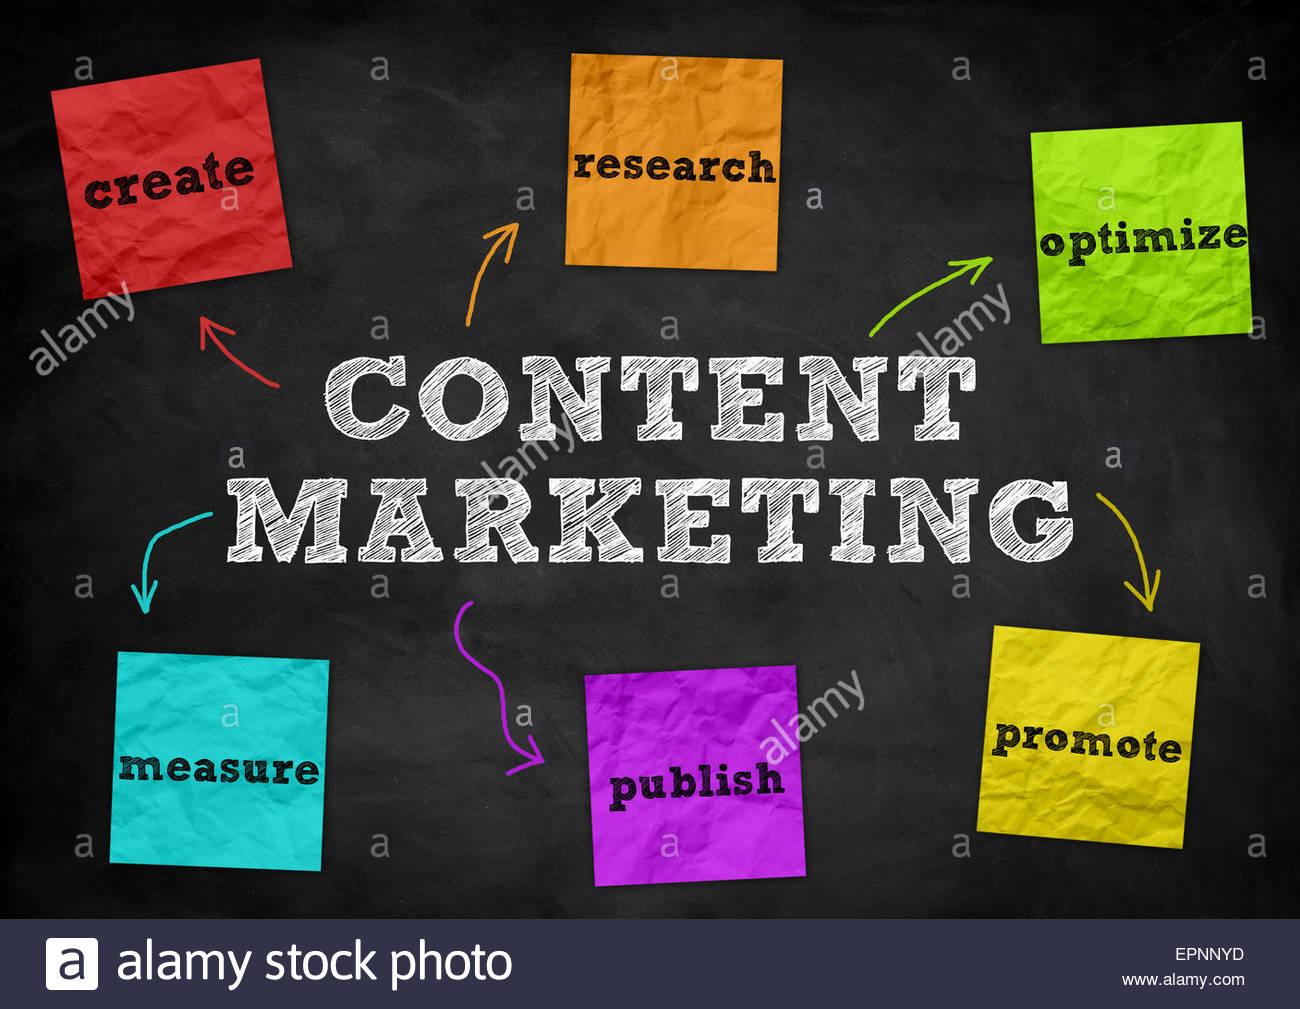 Contenido Marketing - Concepto de pizarra Imagen De Stock